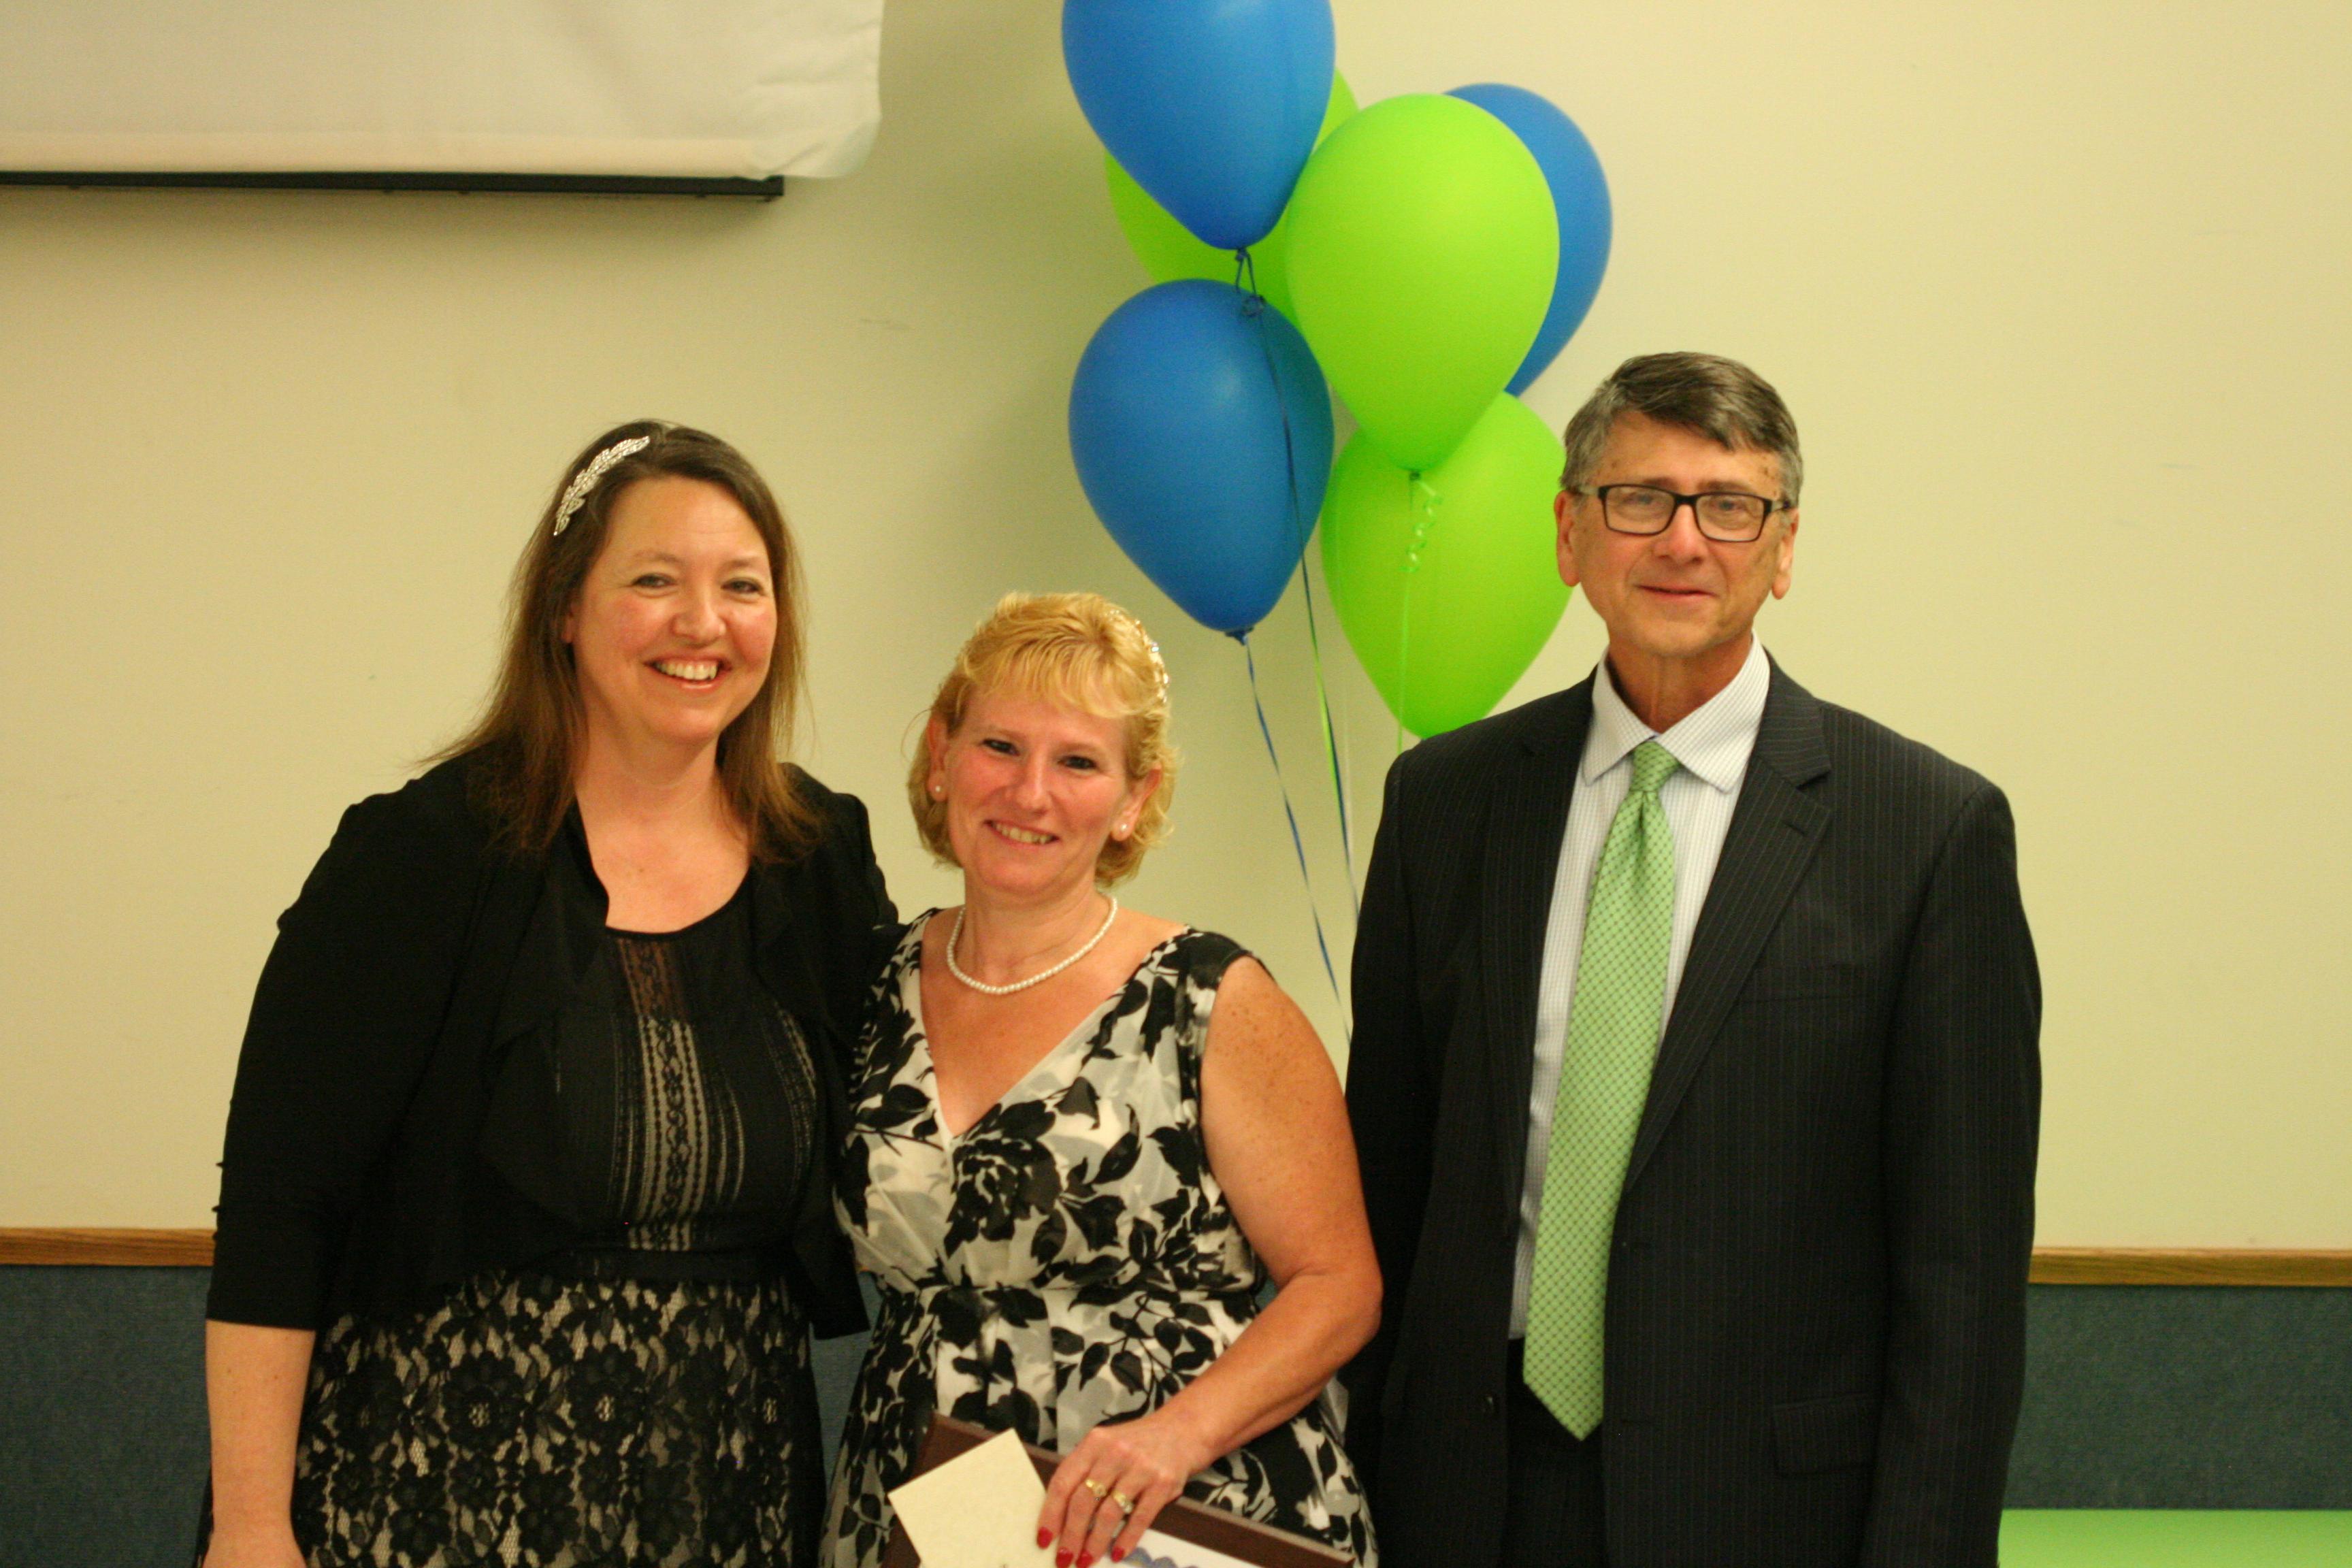 Sally Cory, Employee of the Year Award Recipient